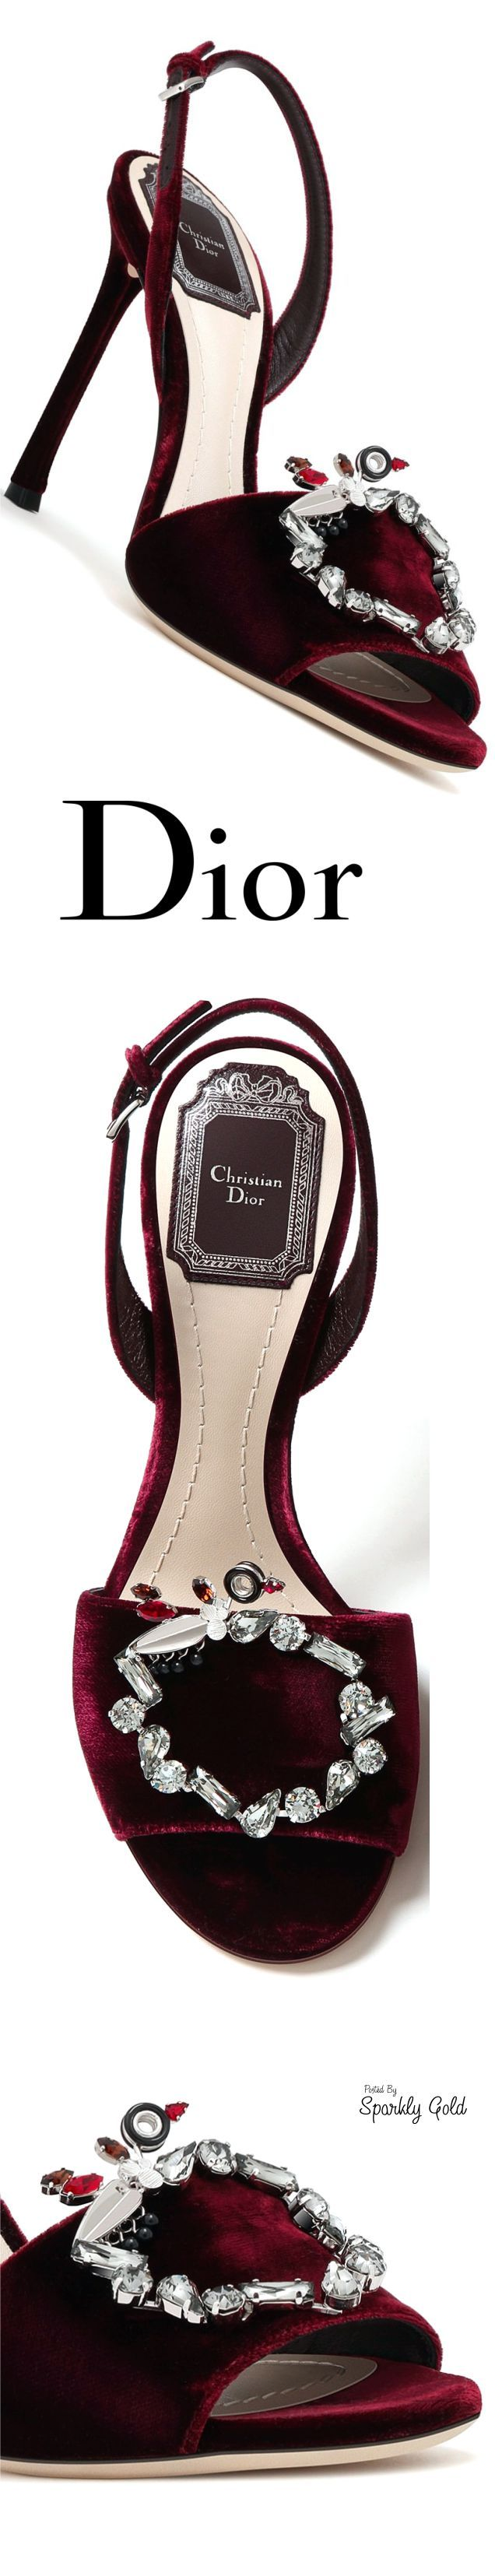 Dior   @ my sexz shoes2